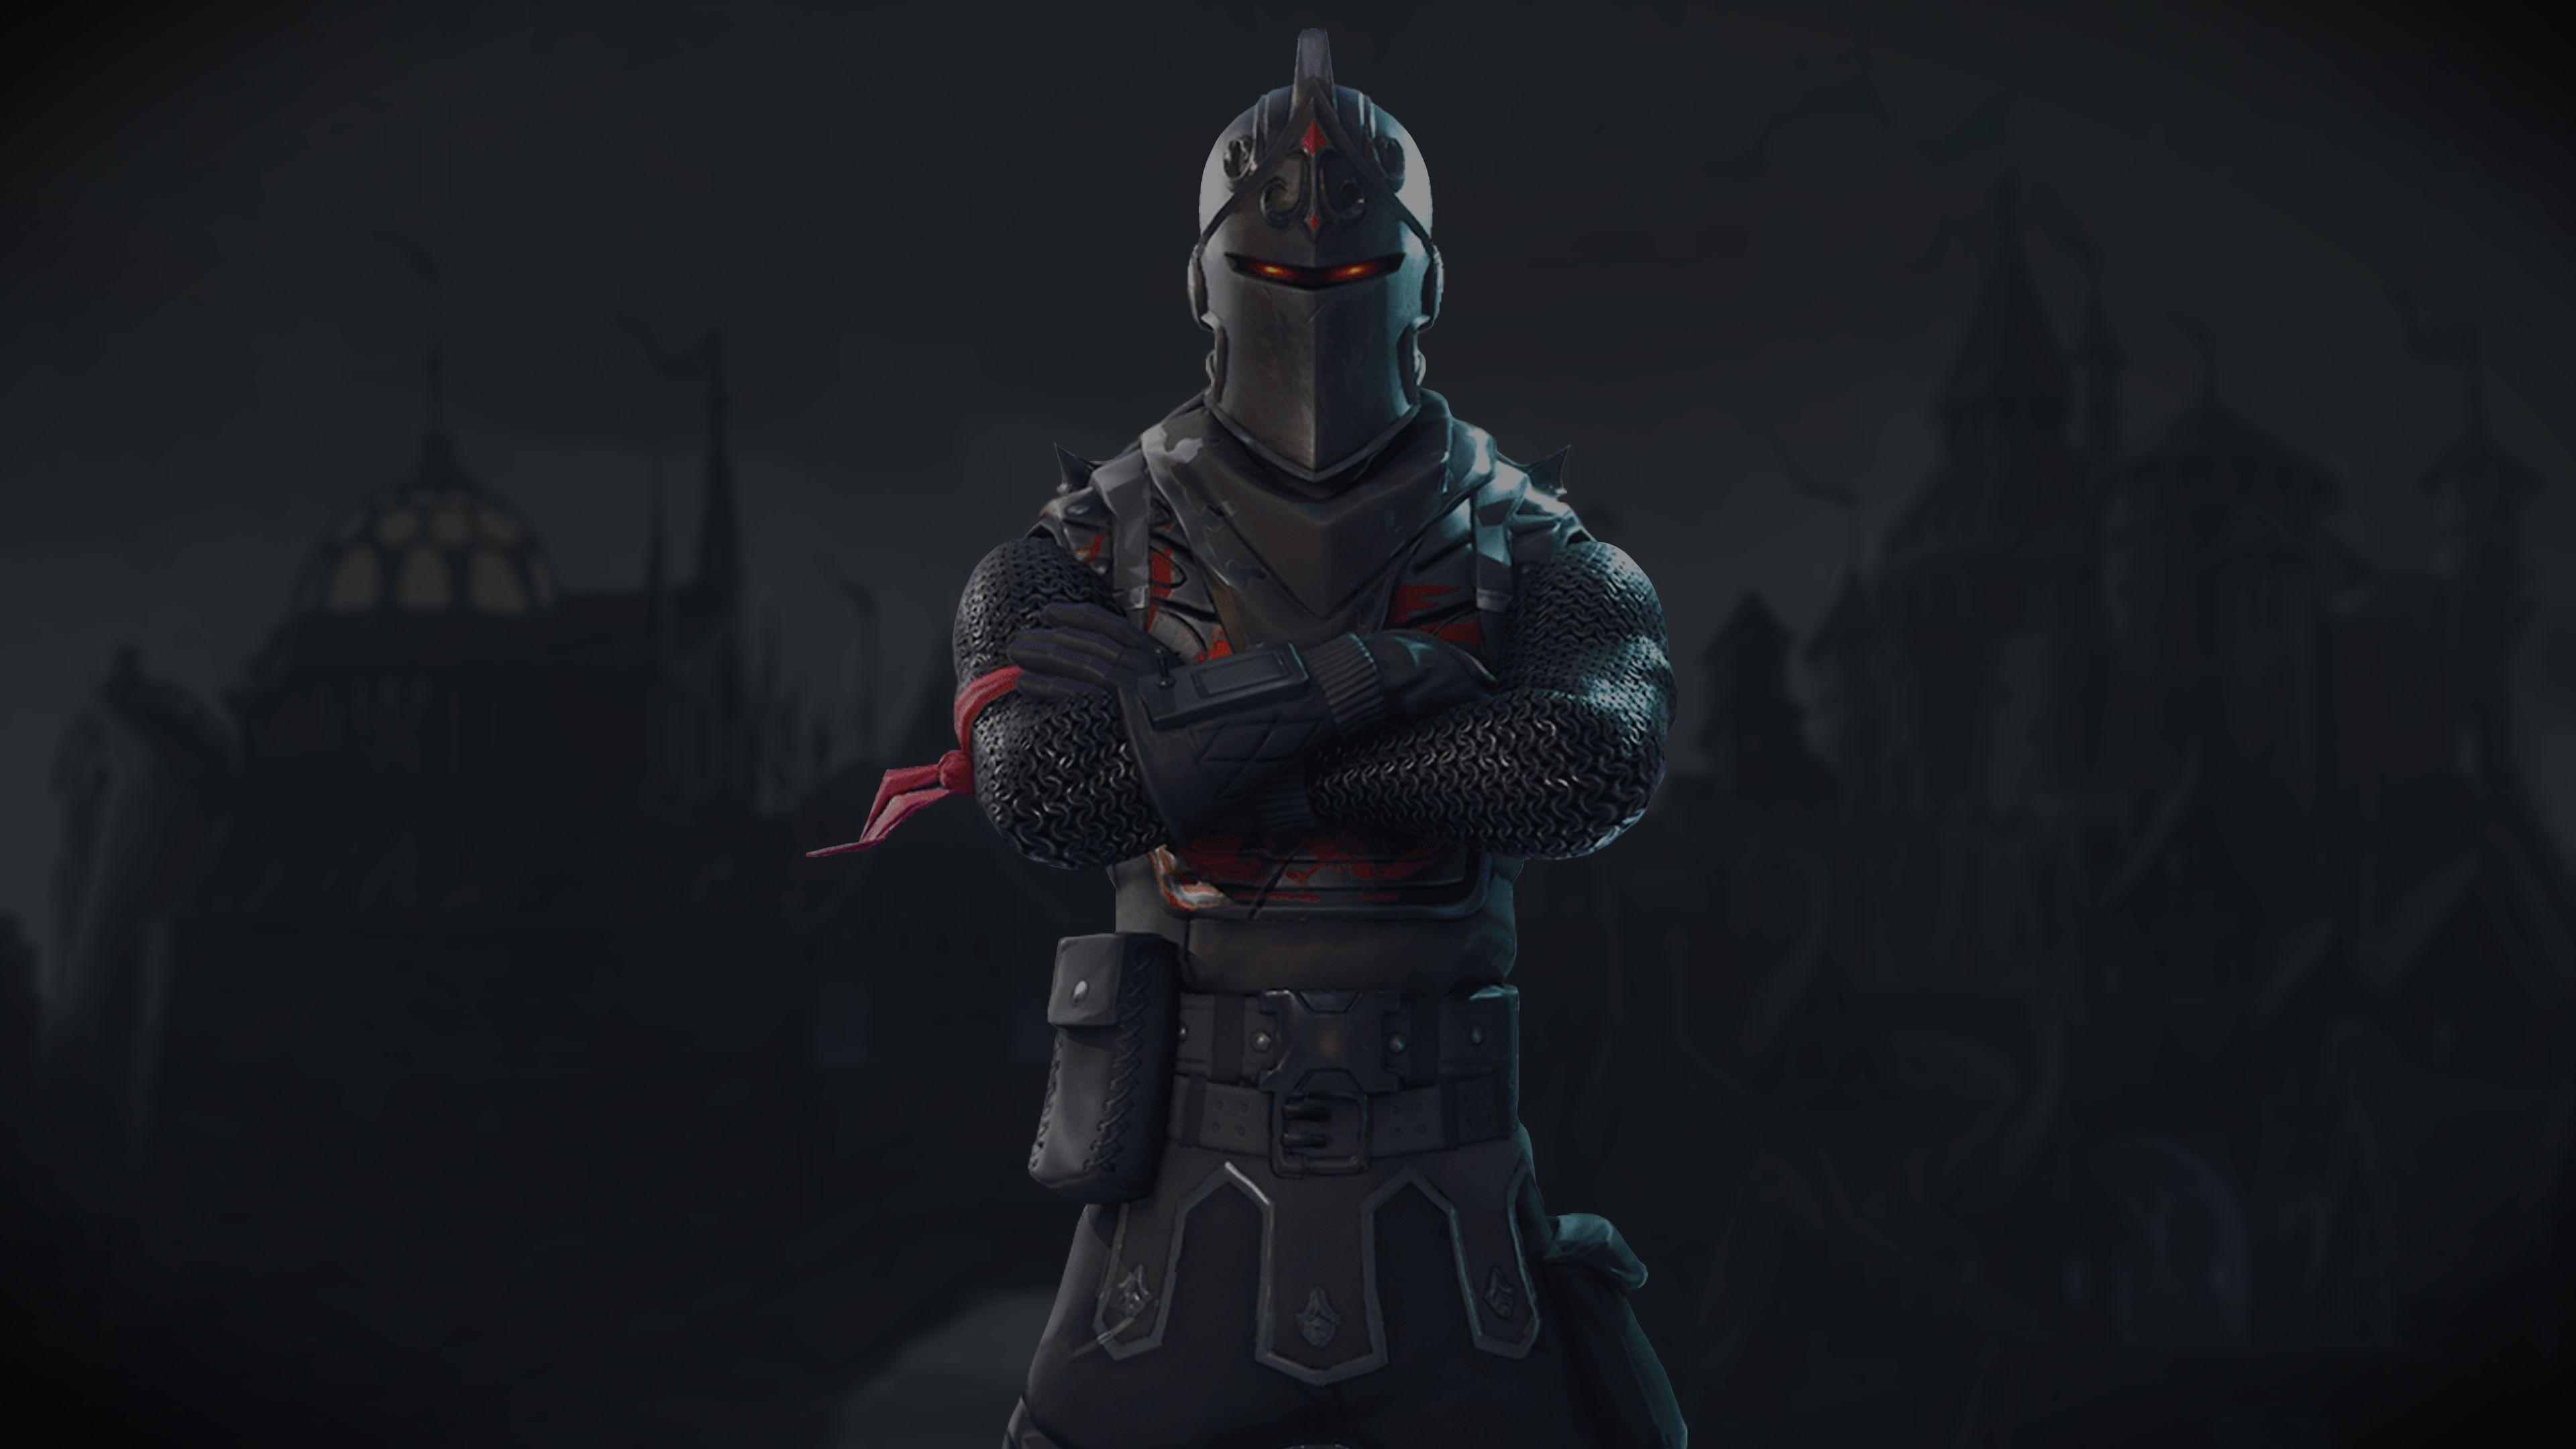 Black Knight Fortnite Battle Royale Video Game 3840x2160